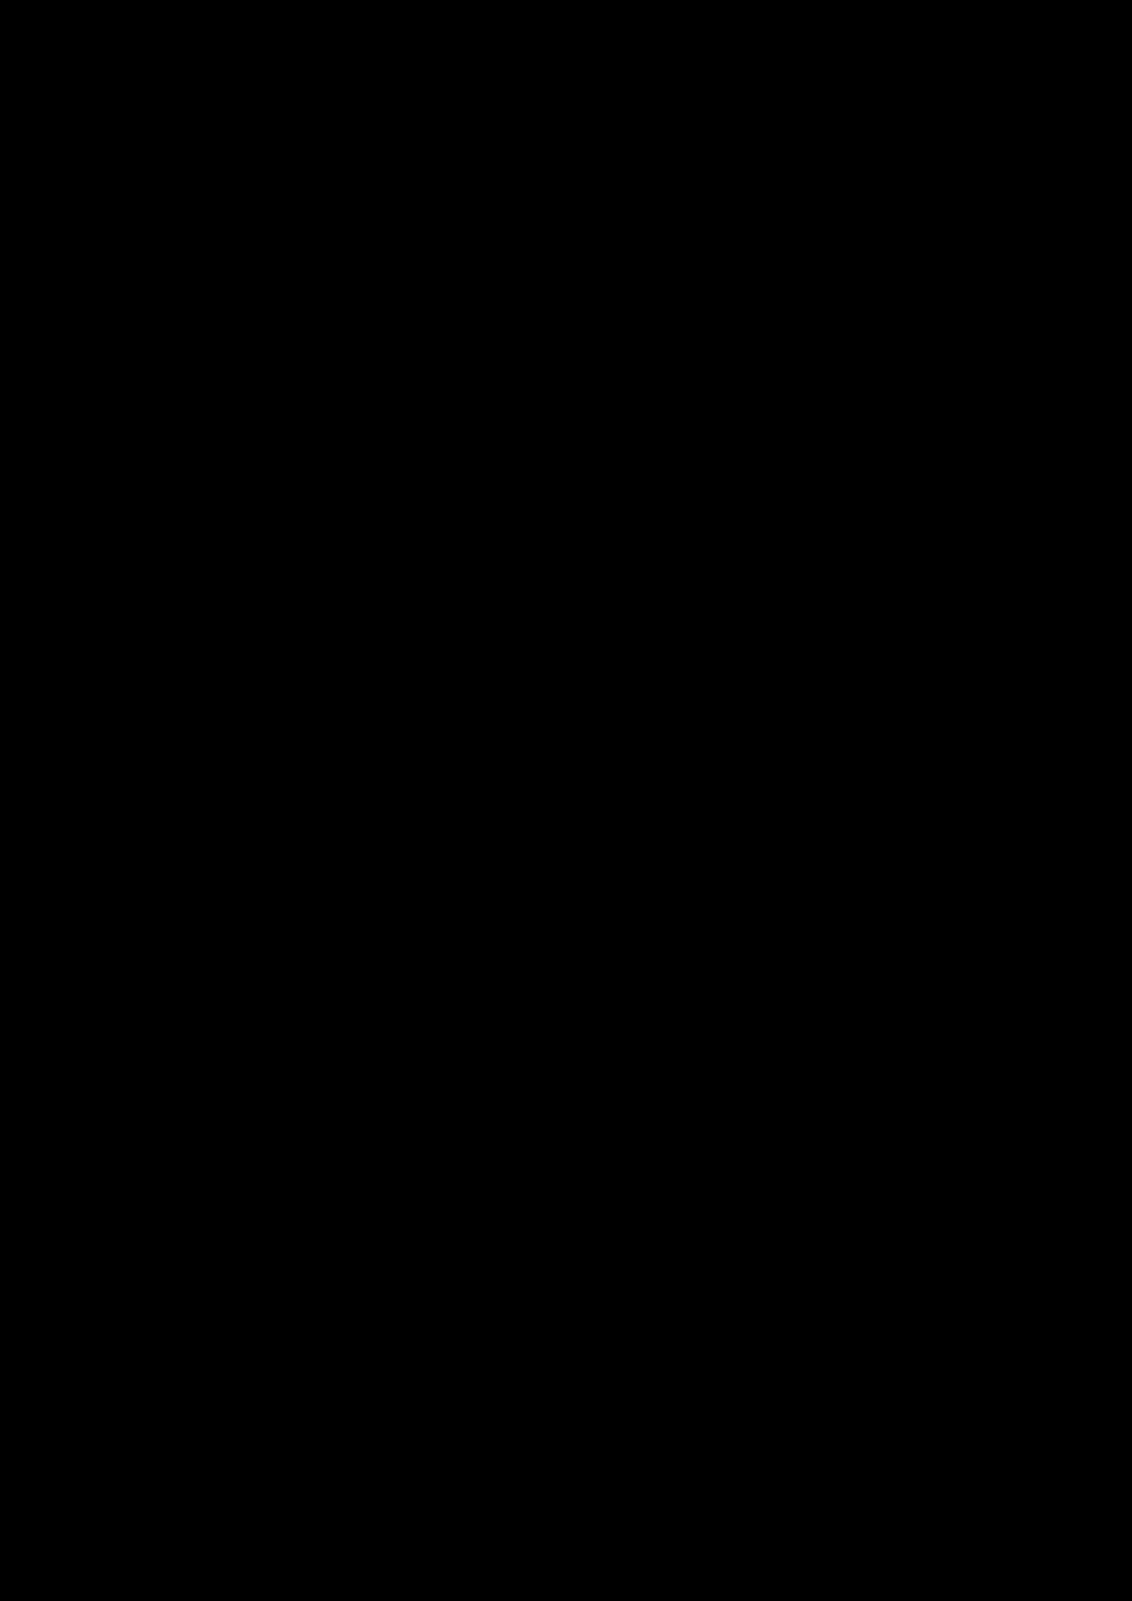 N.A.S.T.YA slide, Image 48